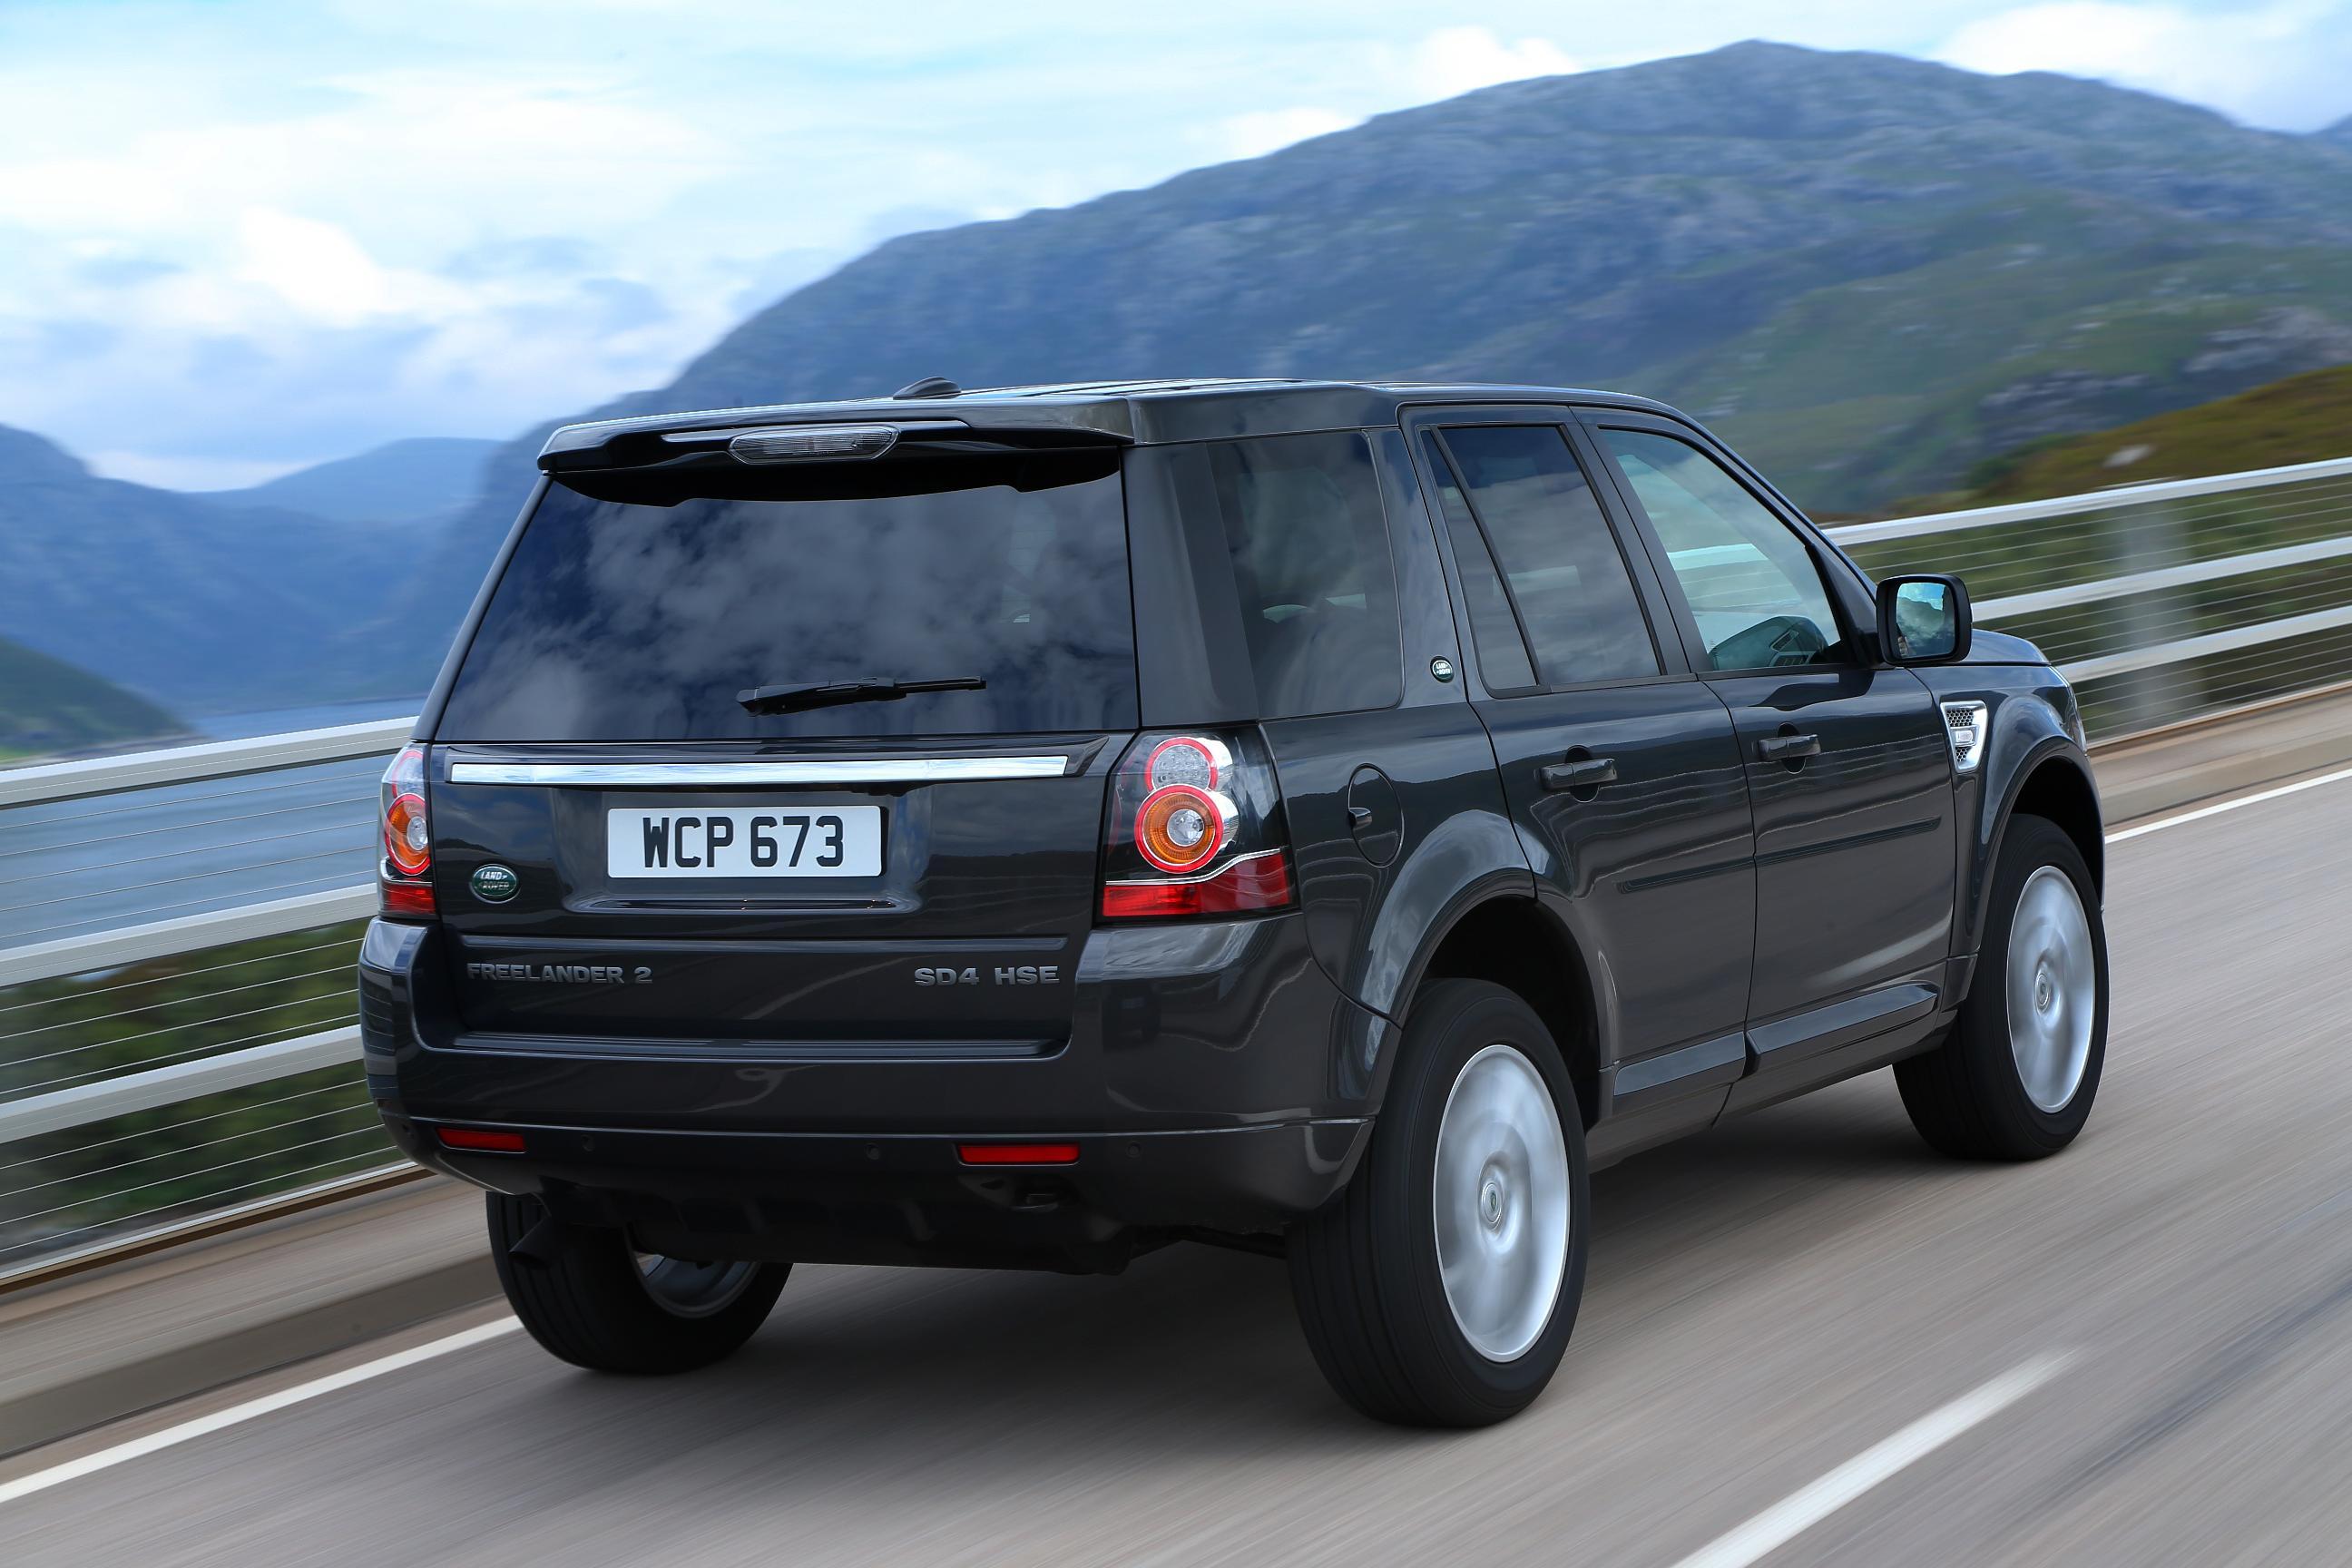 https://www.automobilesreview.com/gallery/2013-land-rover-freelander-2/2013-land-rover-freelander-2-08.jpg